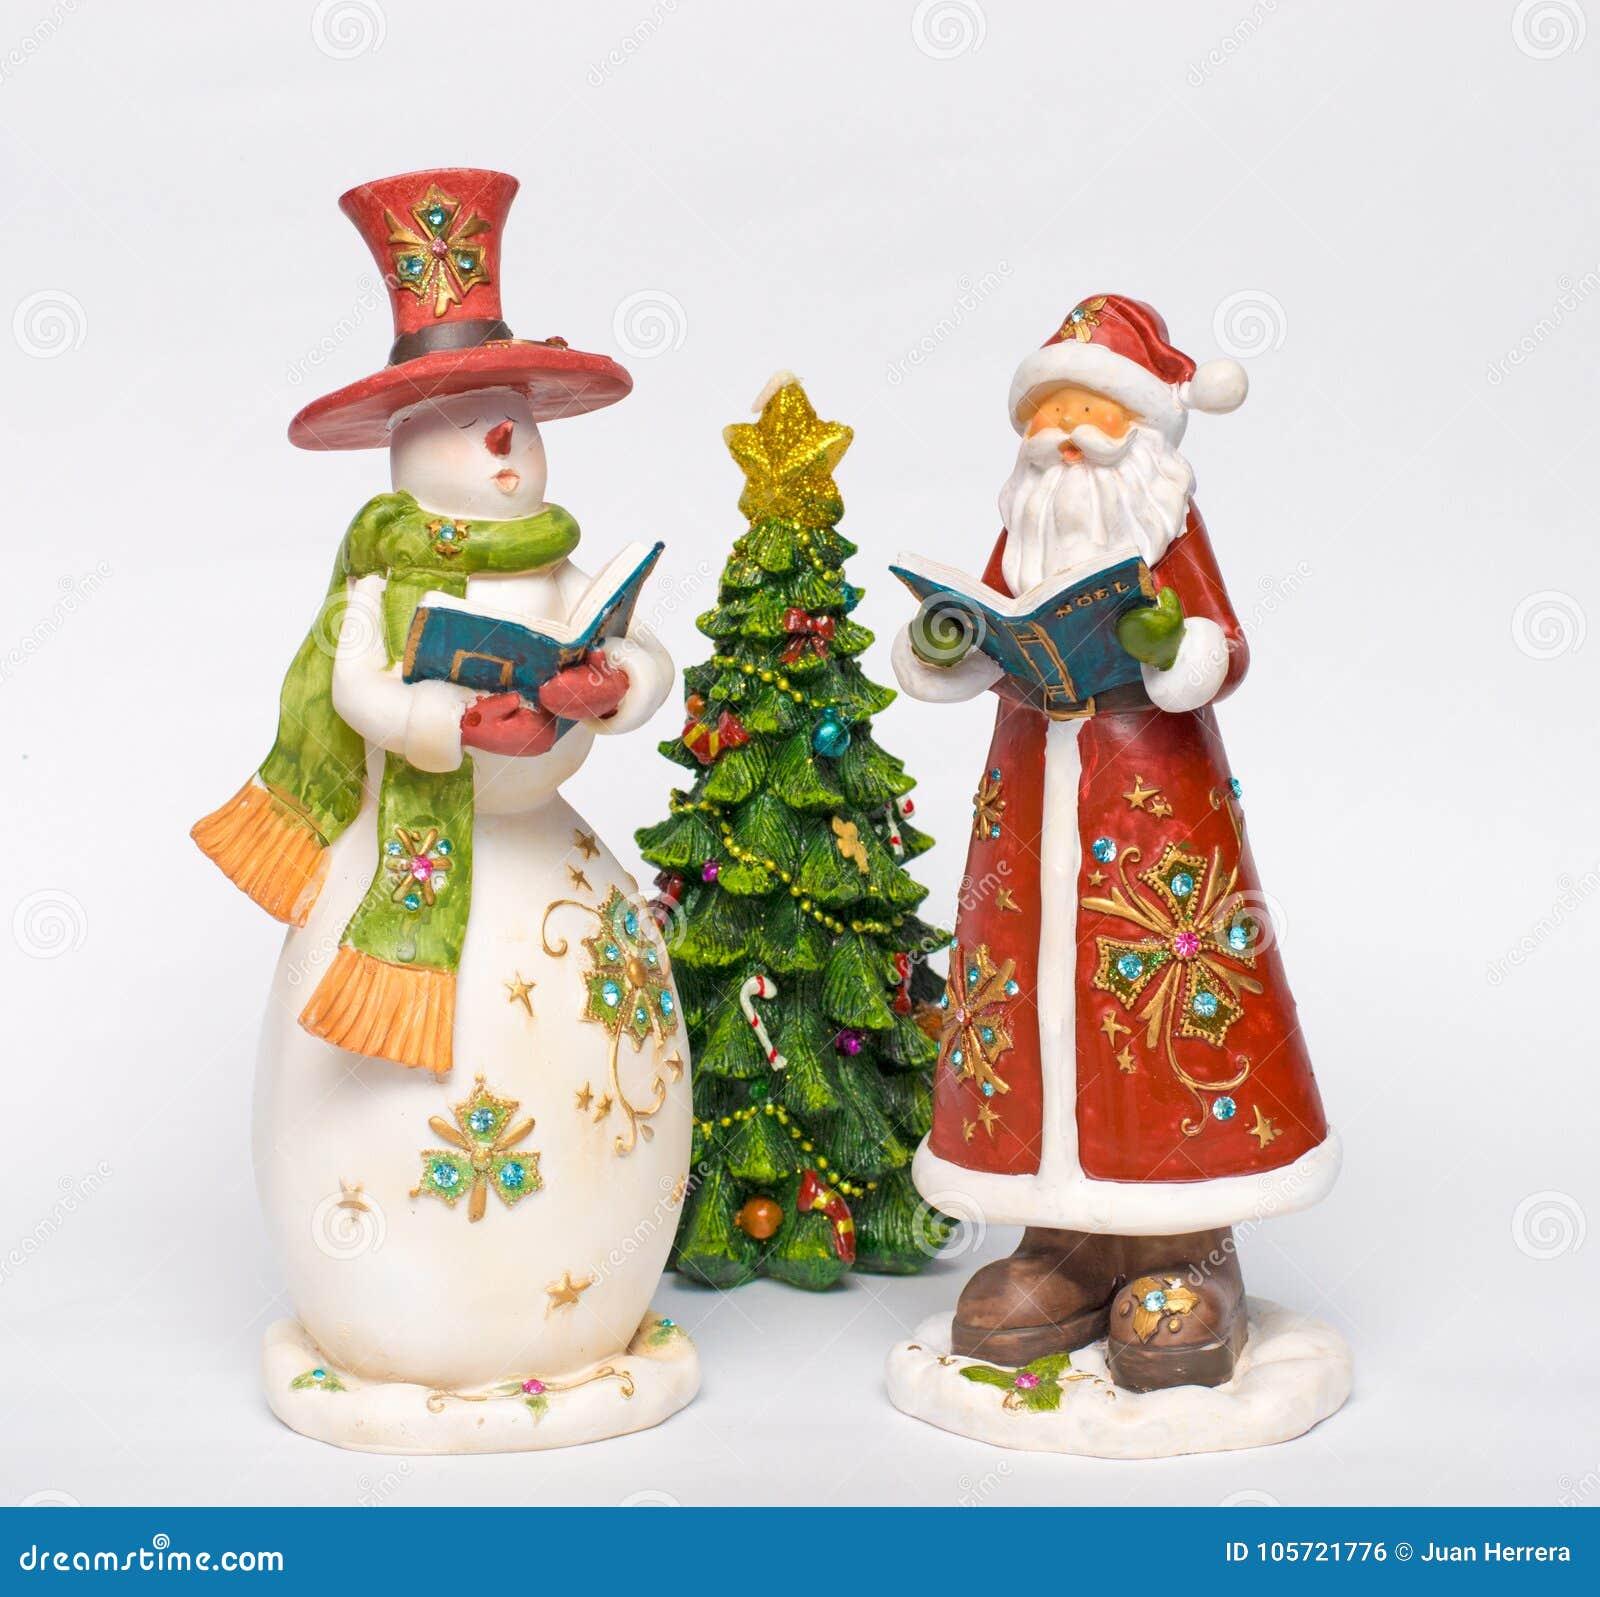 Christmas Carol Singers Figurines.Snowman And Santa Singing Christmas Carols Stock Photo